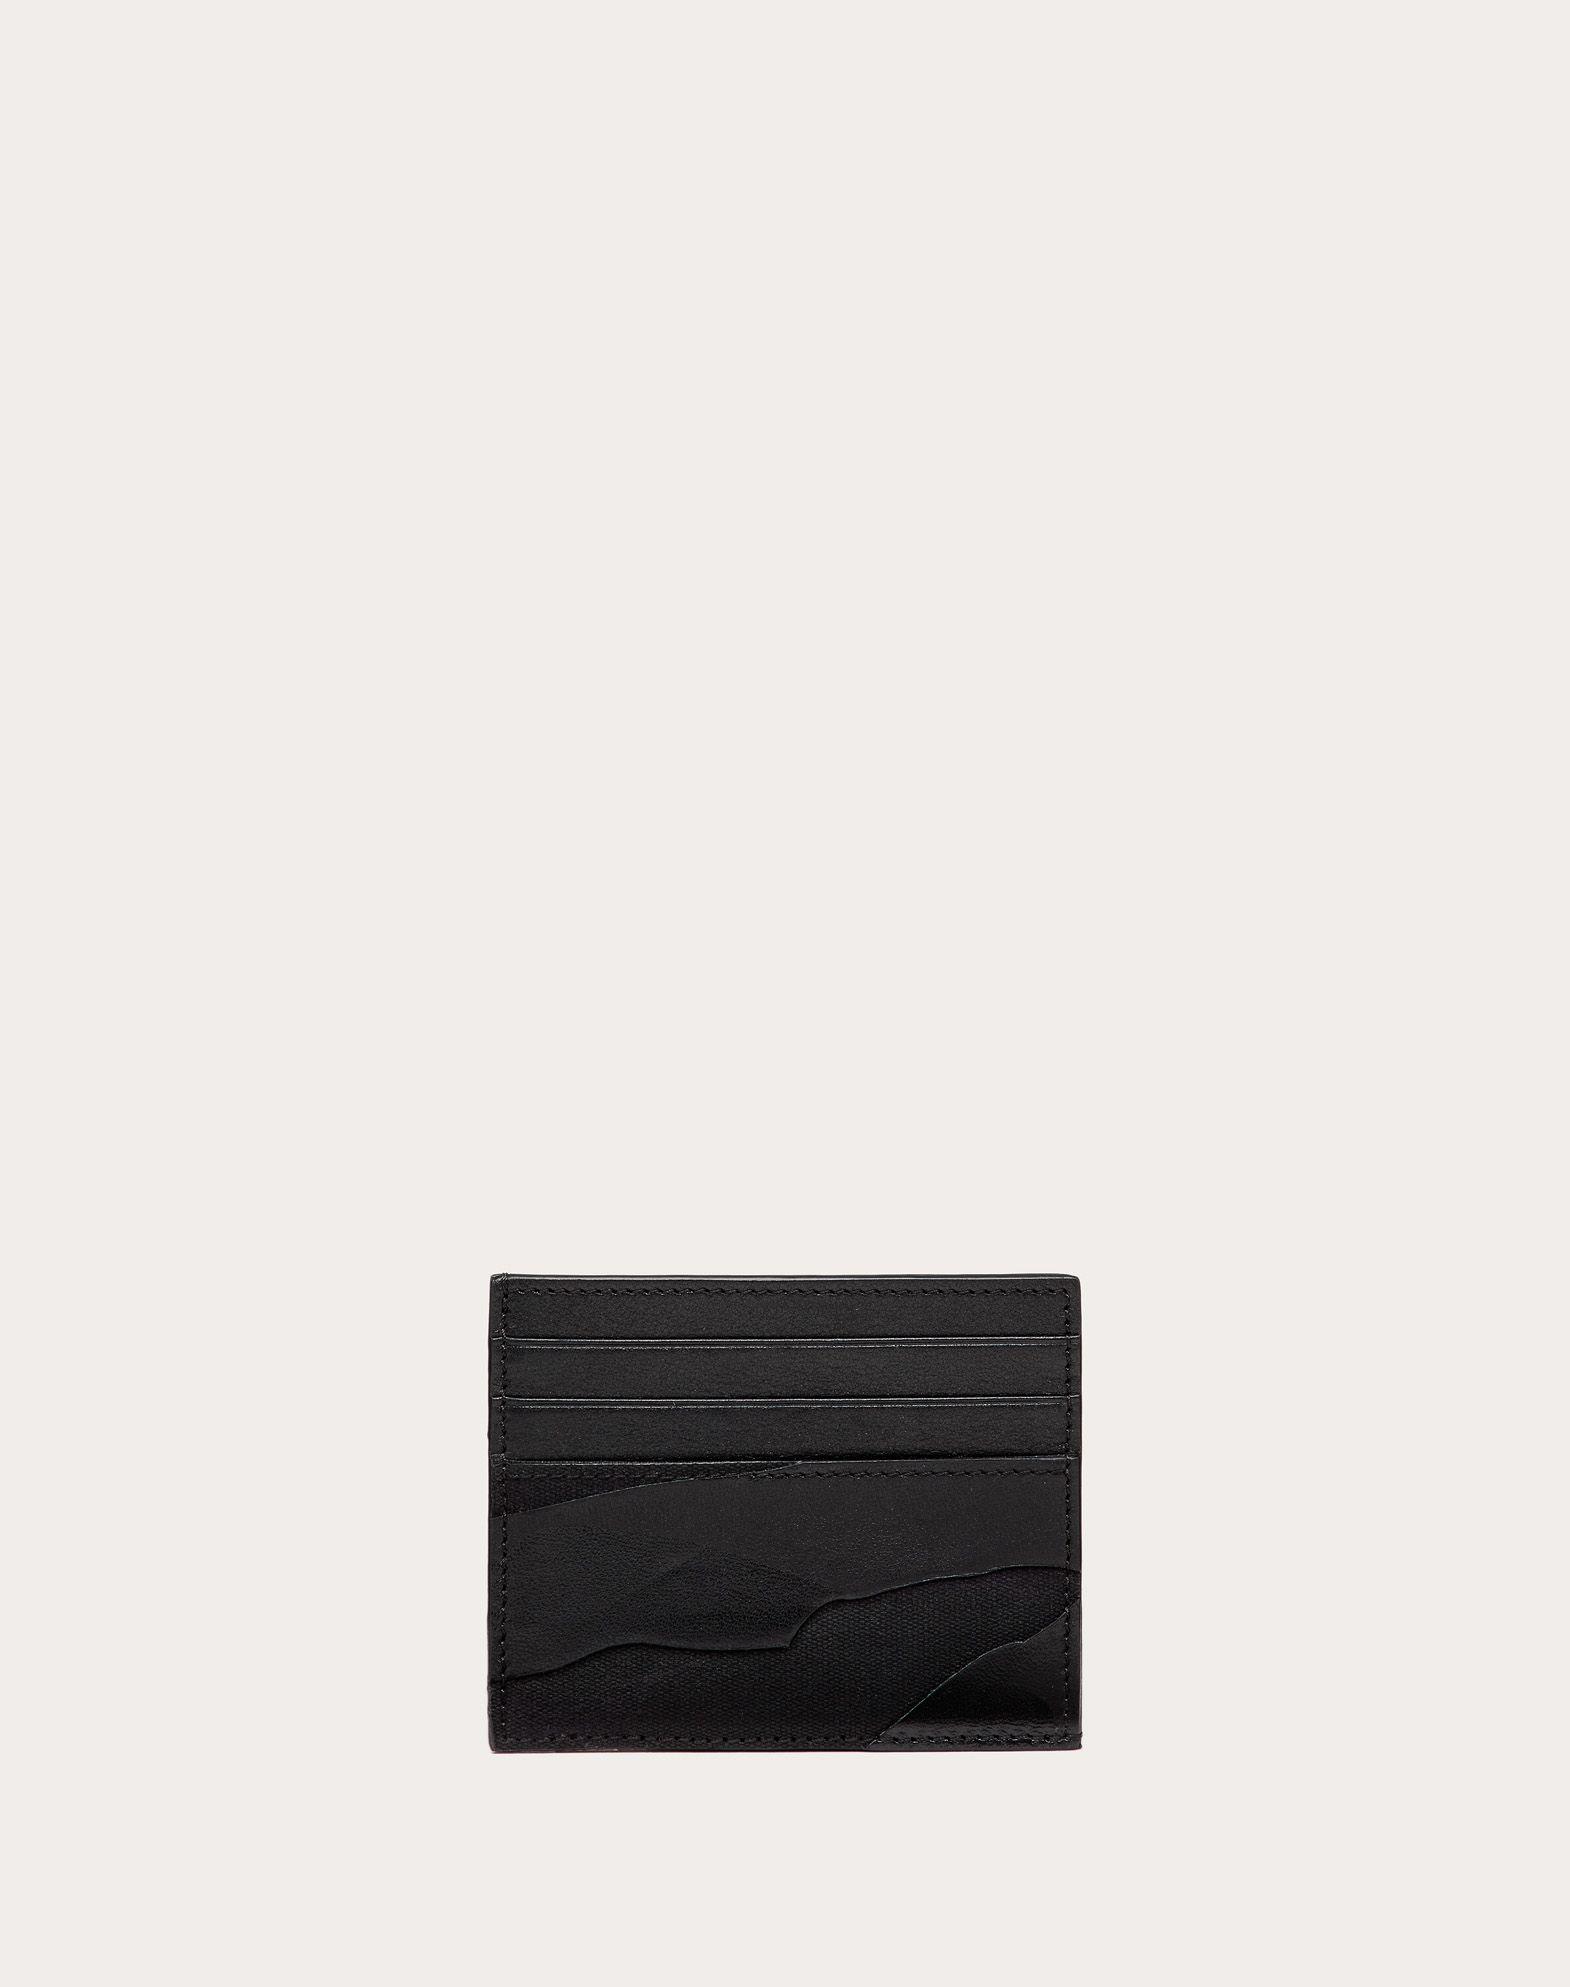 VALENTINO Canvas Logo Solid color External pockets Internal card slots  45414515si